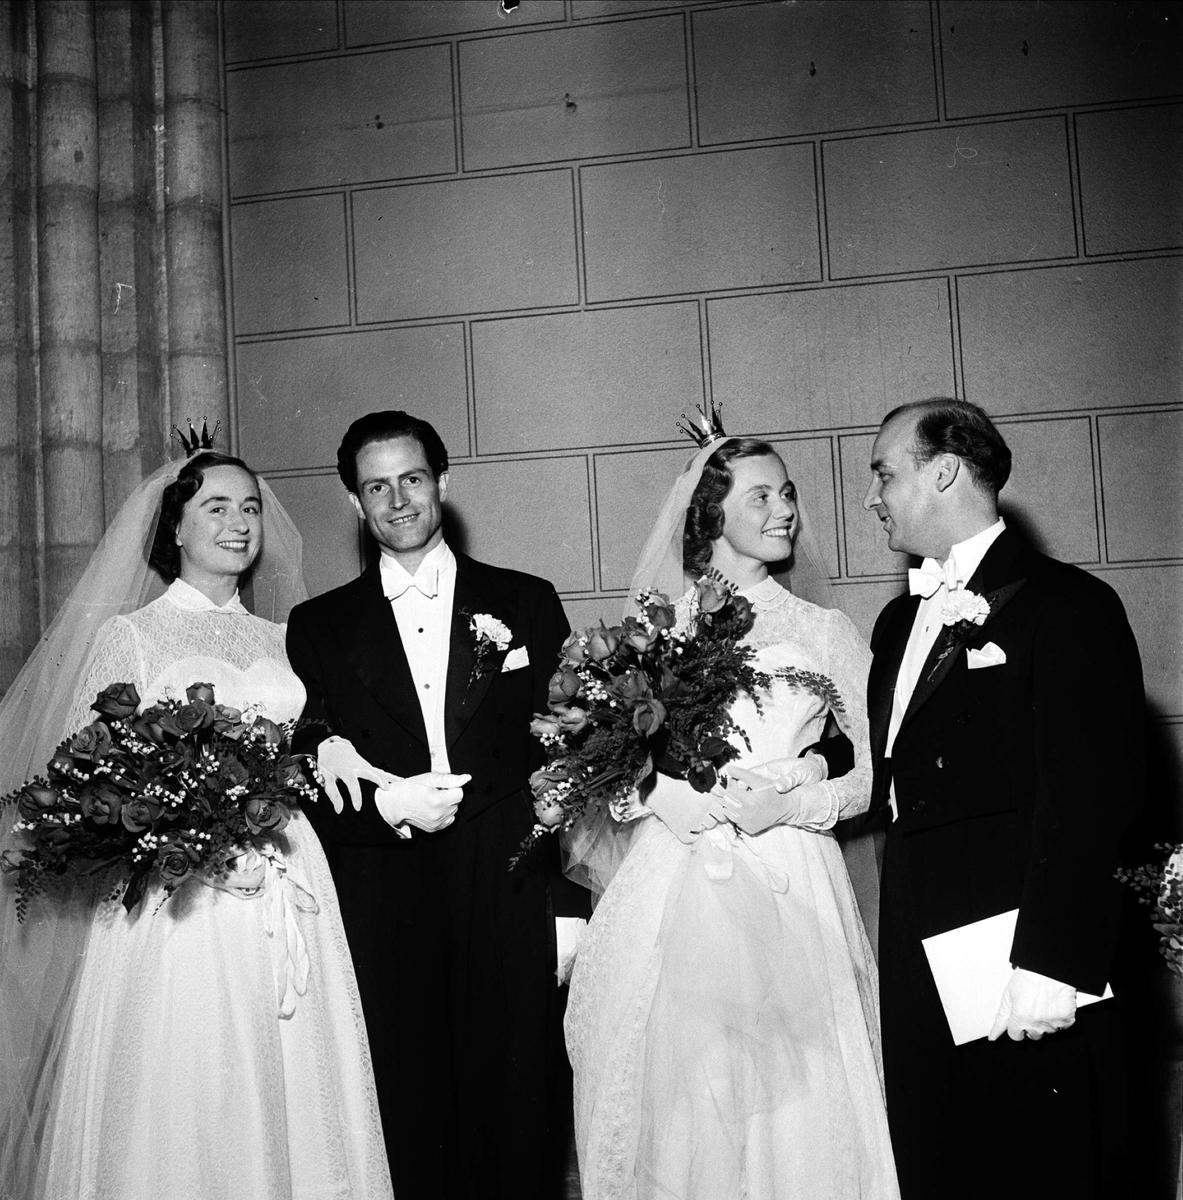 Bröllop - dubbelbröllop i Uppsala domkyrka, Wiberg, september 1952